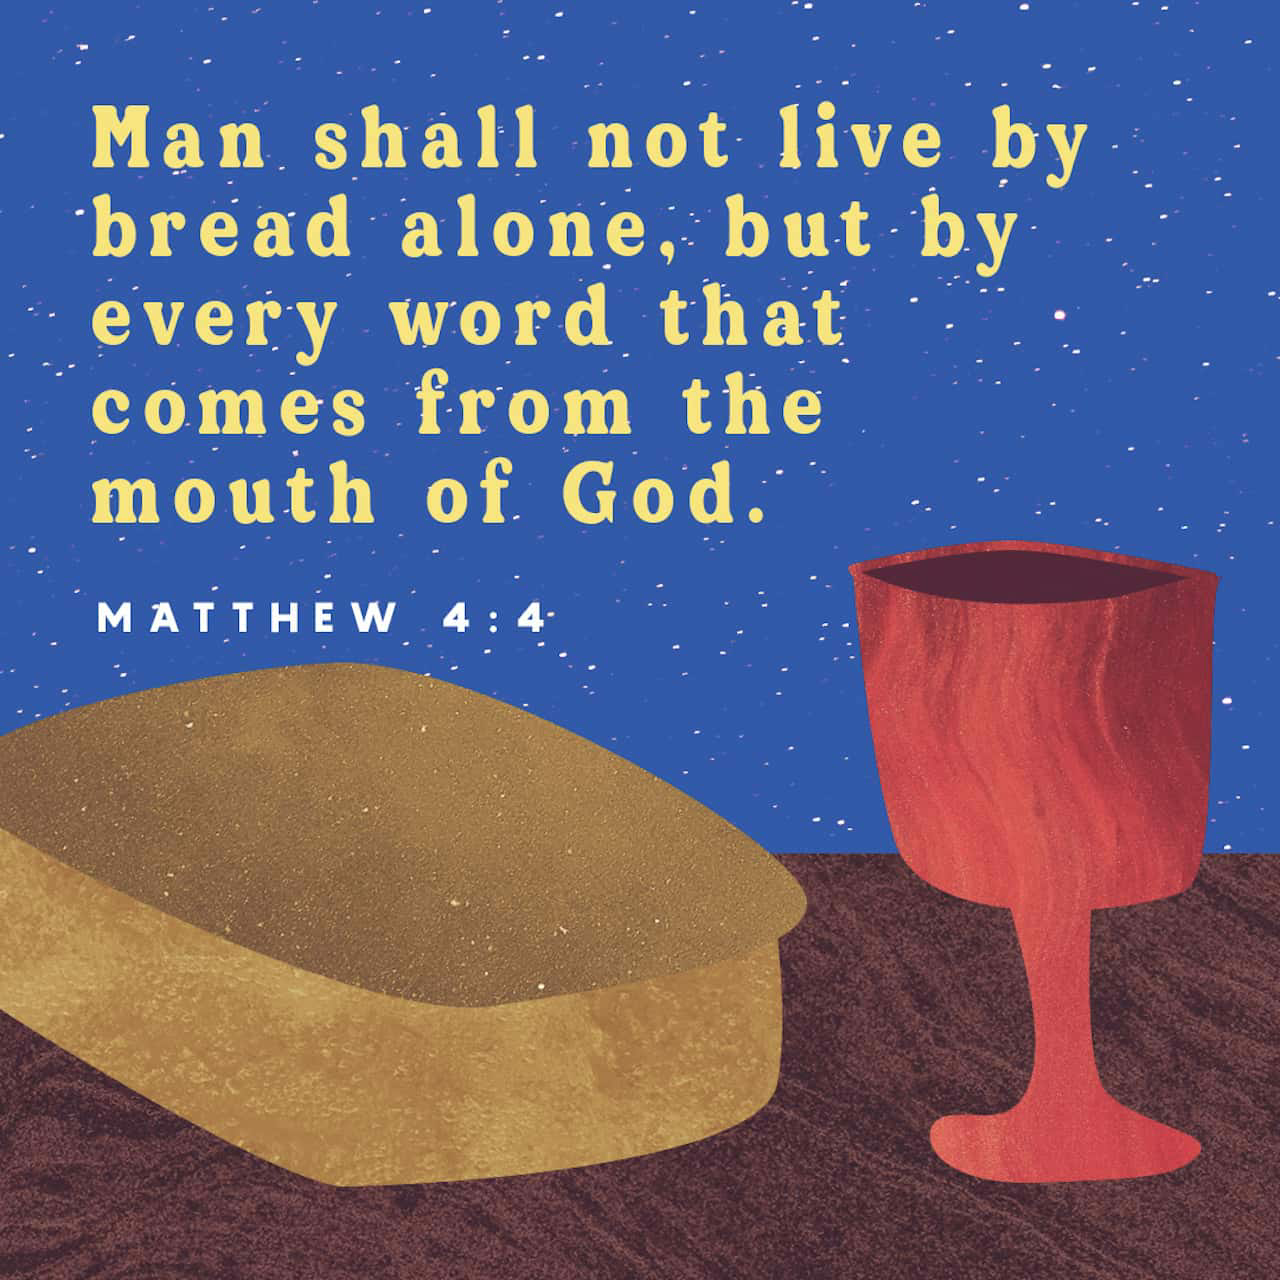 Verse of the day- Matthew 4:4